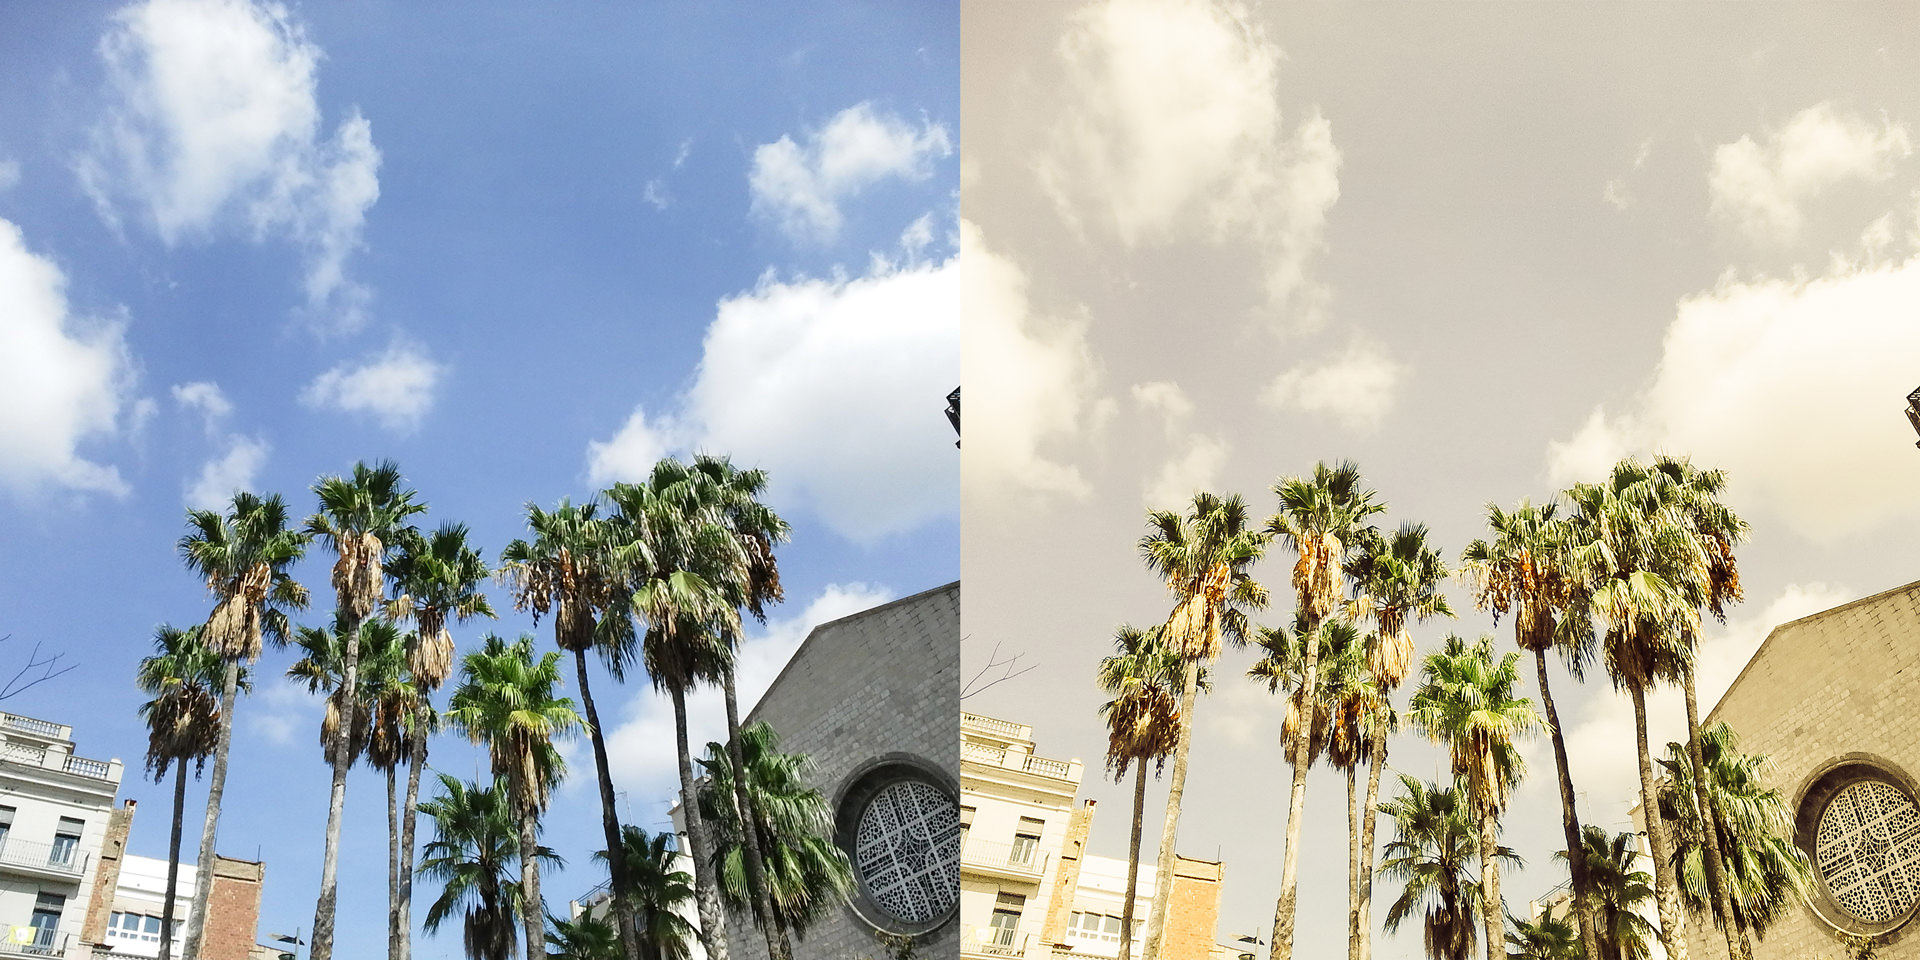 Digitale Datei aus der Fuji SQ 10 – Ohne bearbeitung links, mit Bearbeitung rechts